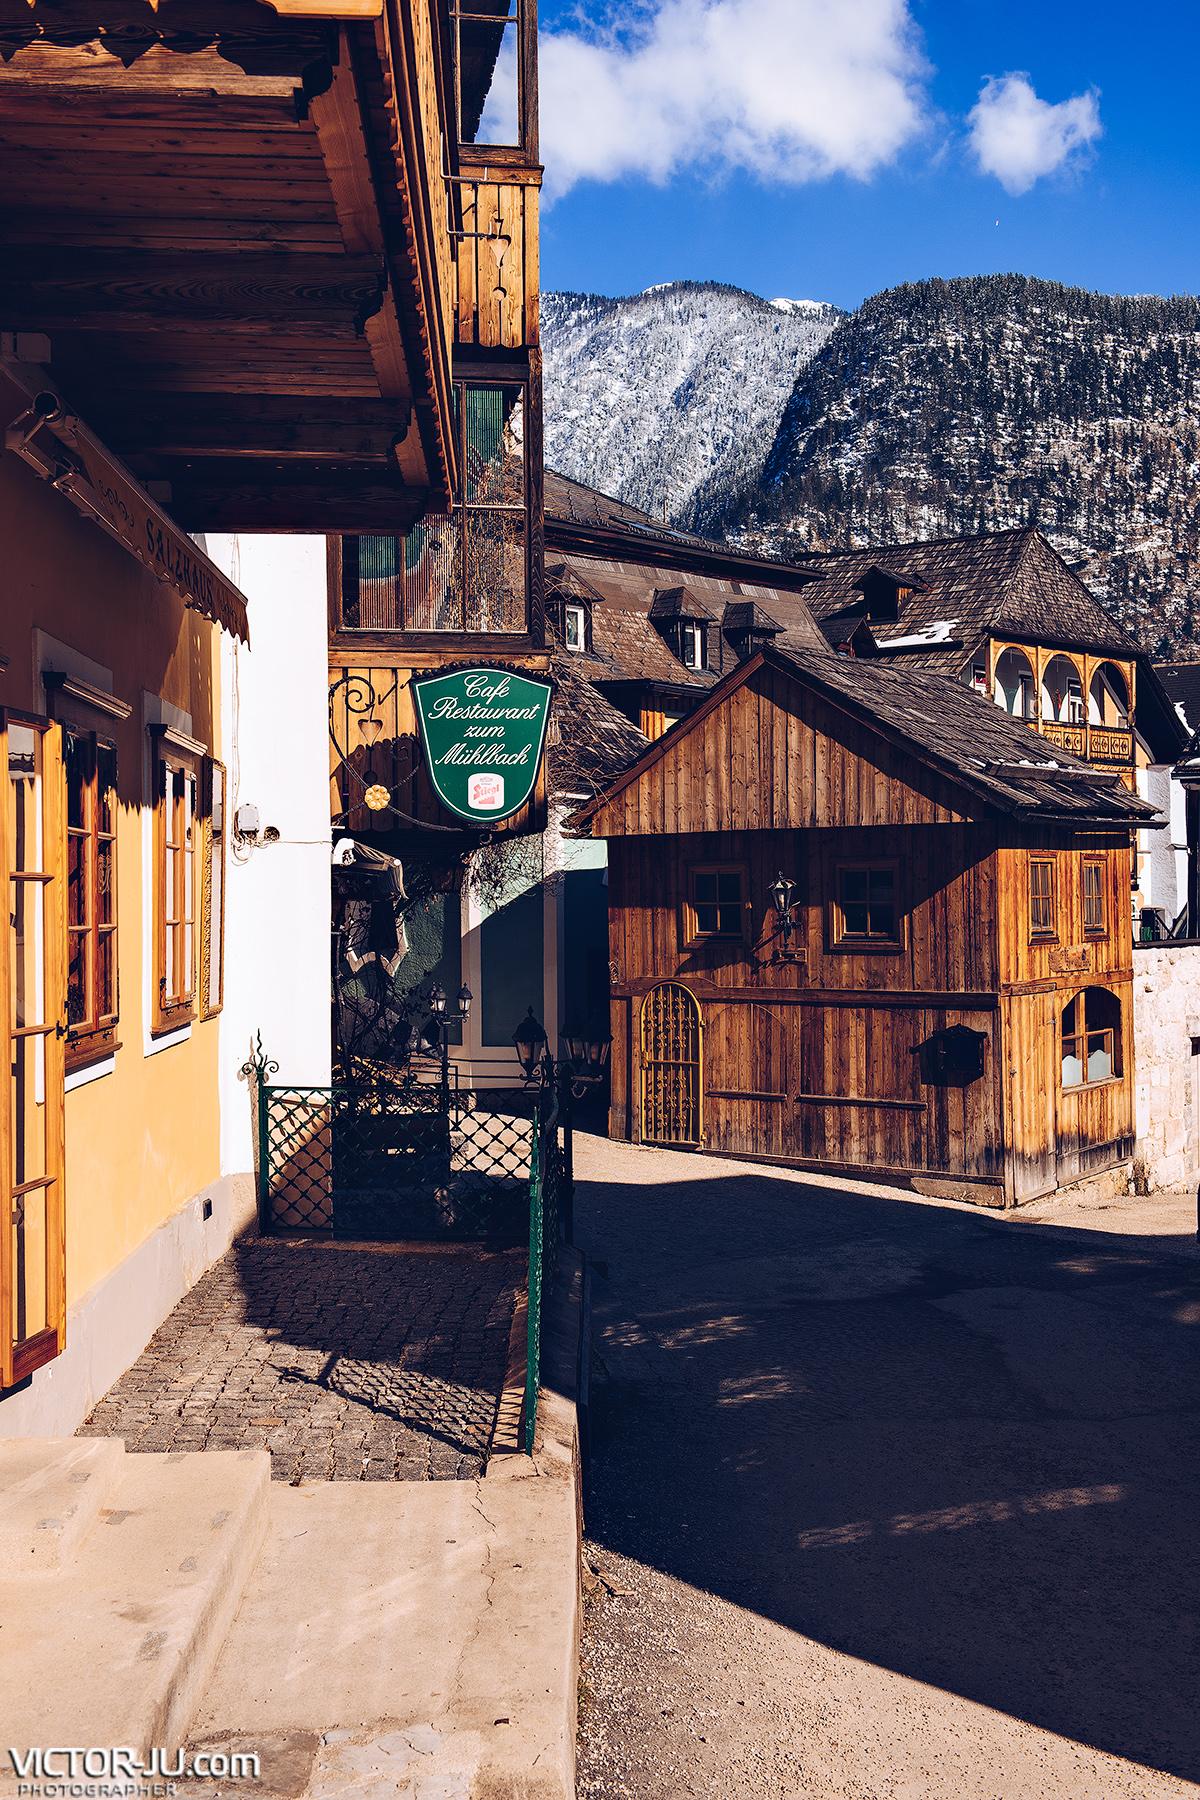 Photo Shoot in Hallstatt Austia